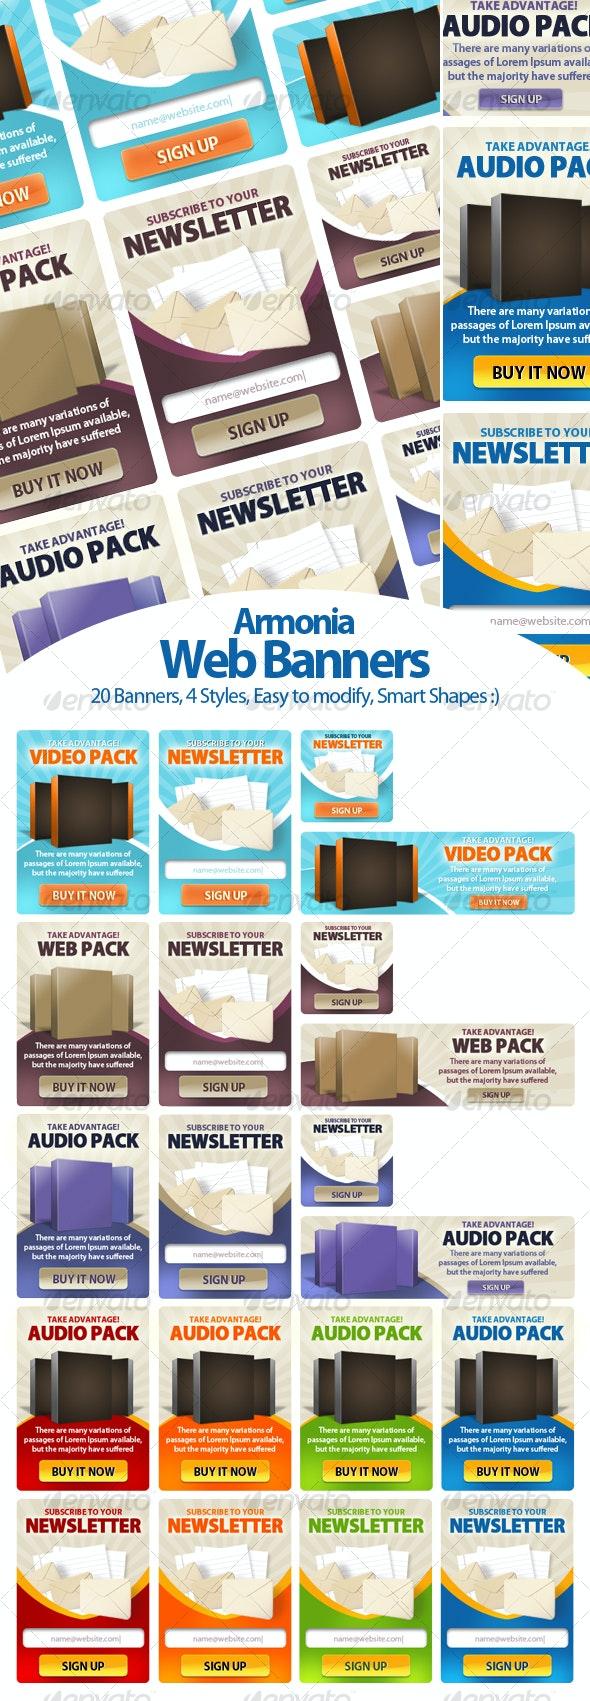 Armonia Web Banners - Web Elements